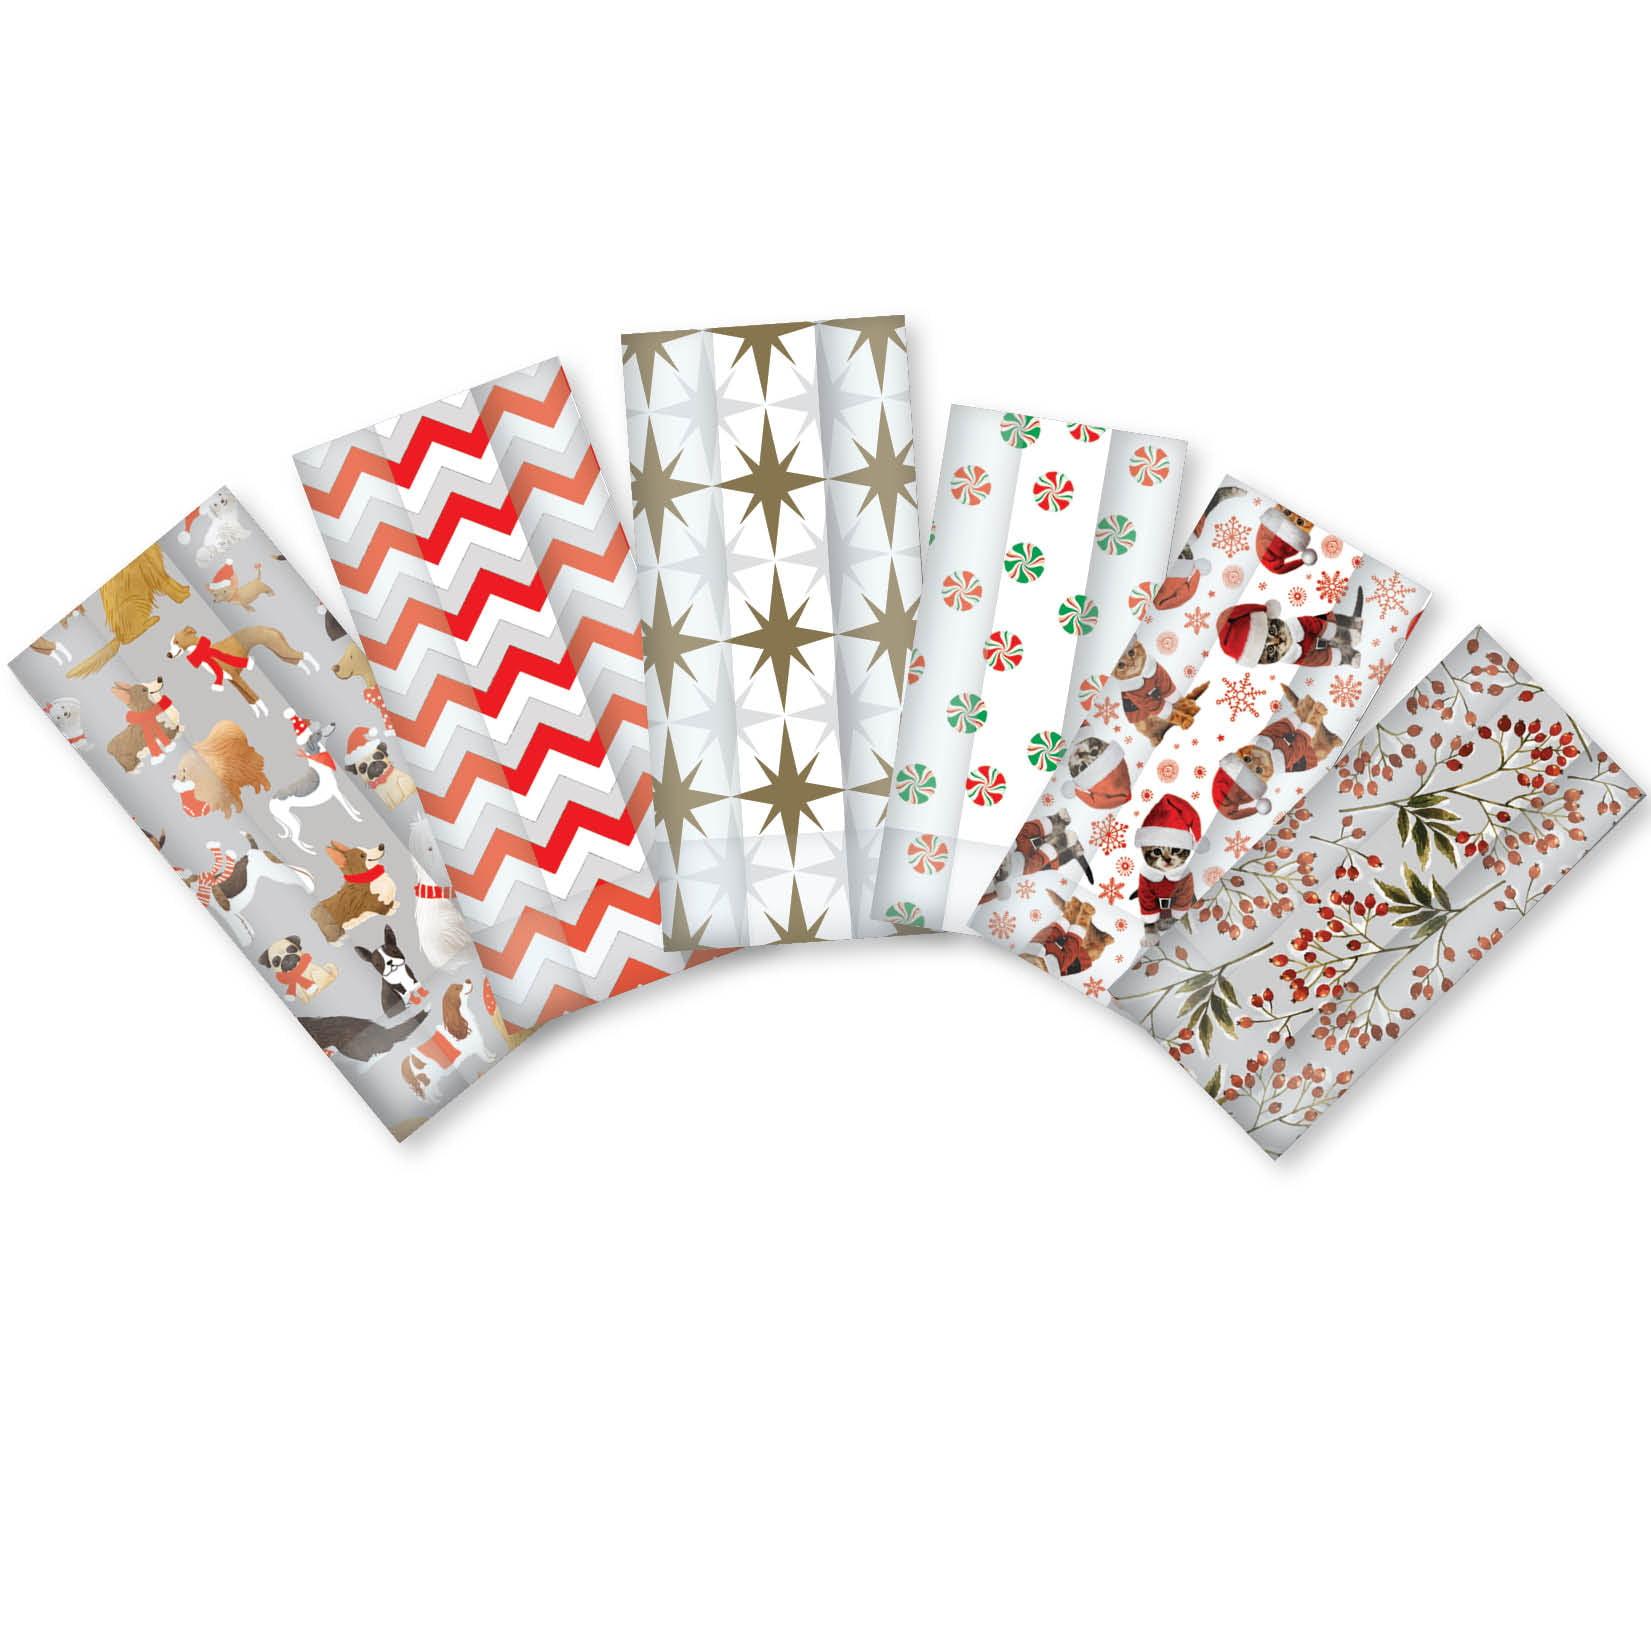 Jillson & Roberts Cello Bag & Twist Tie Assortment, Christmas Designs (48 Bags)